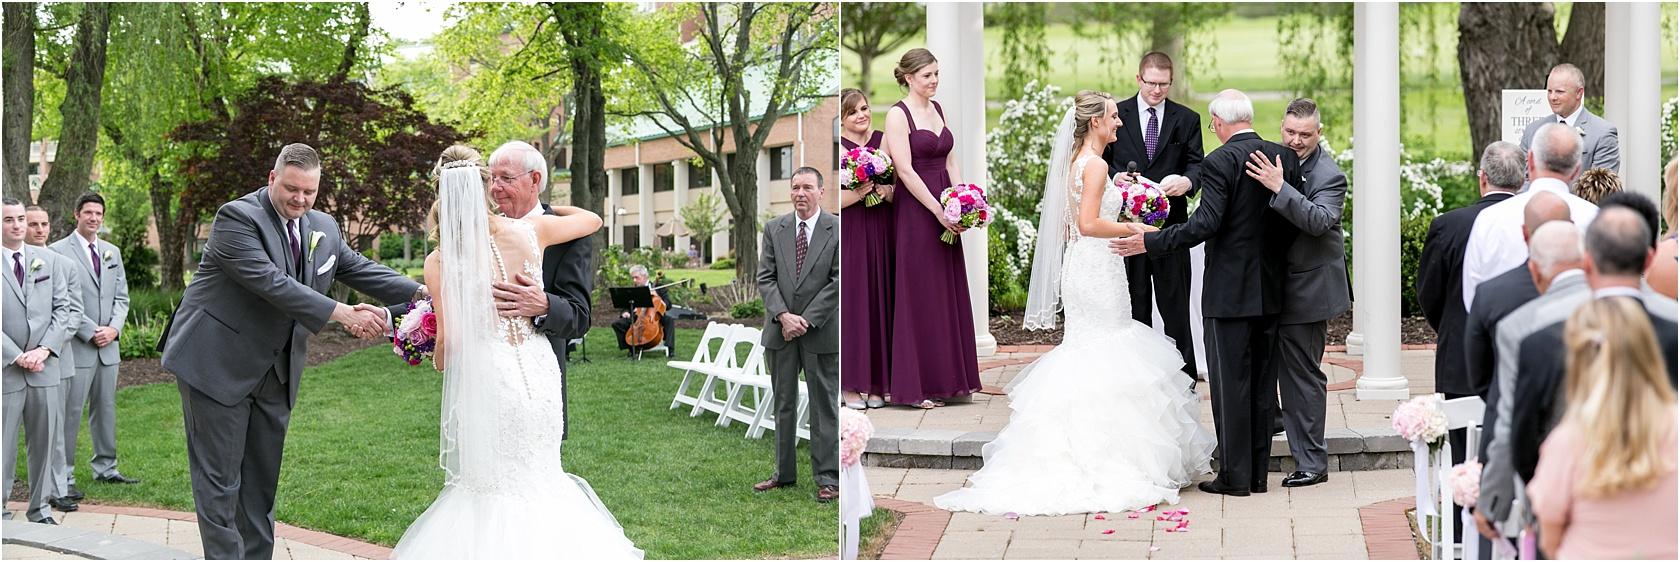 Sagal Wedding Turf Valley Resort Wedding Living Radiant Photography_0079.jpg